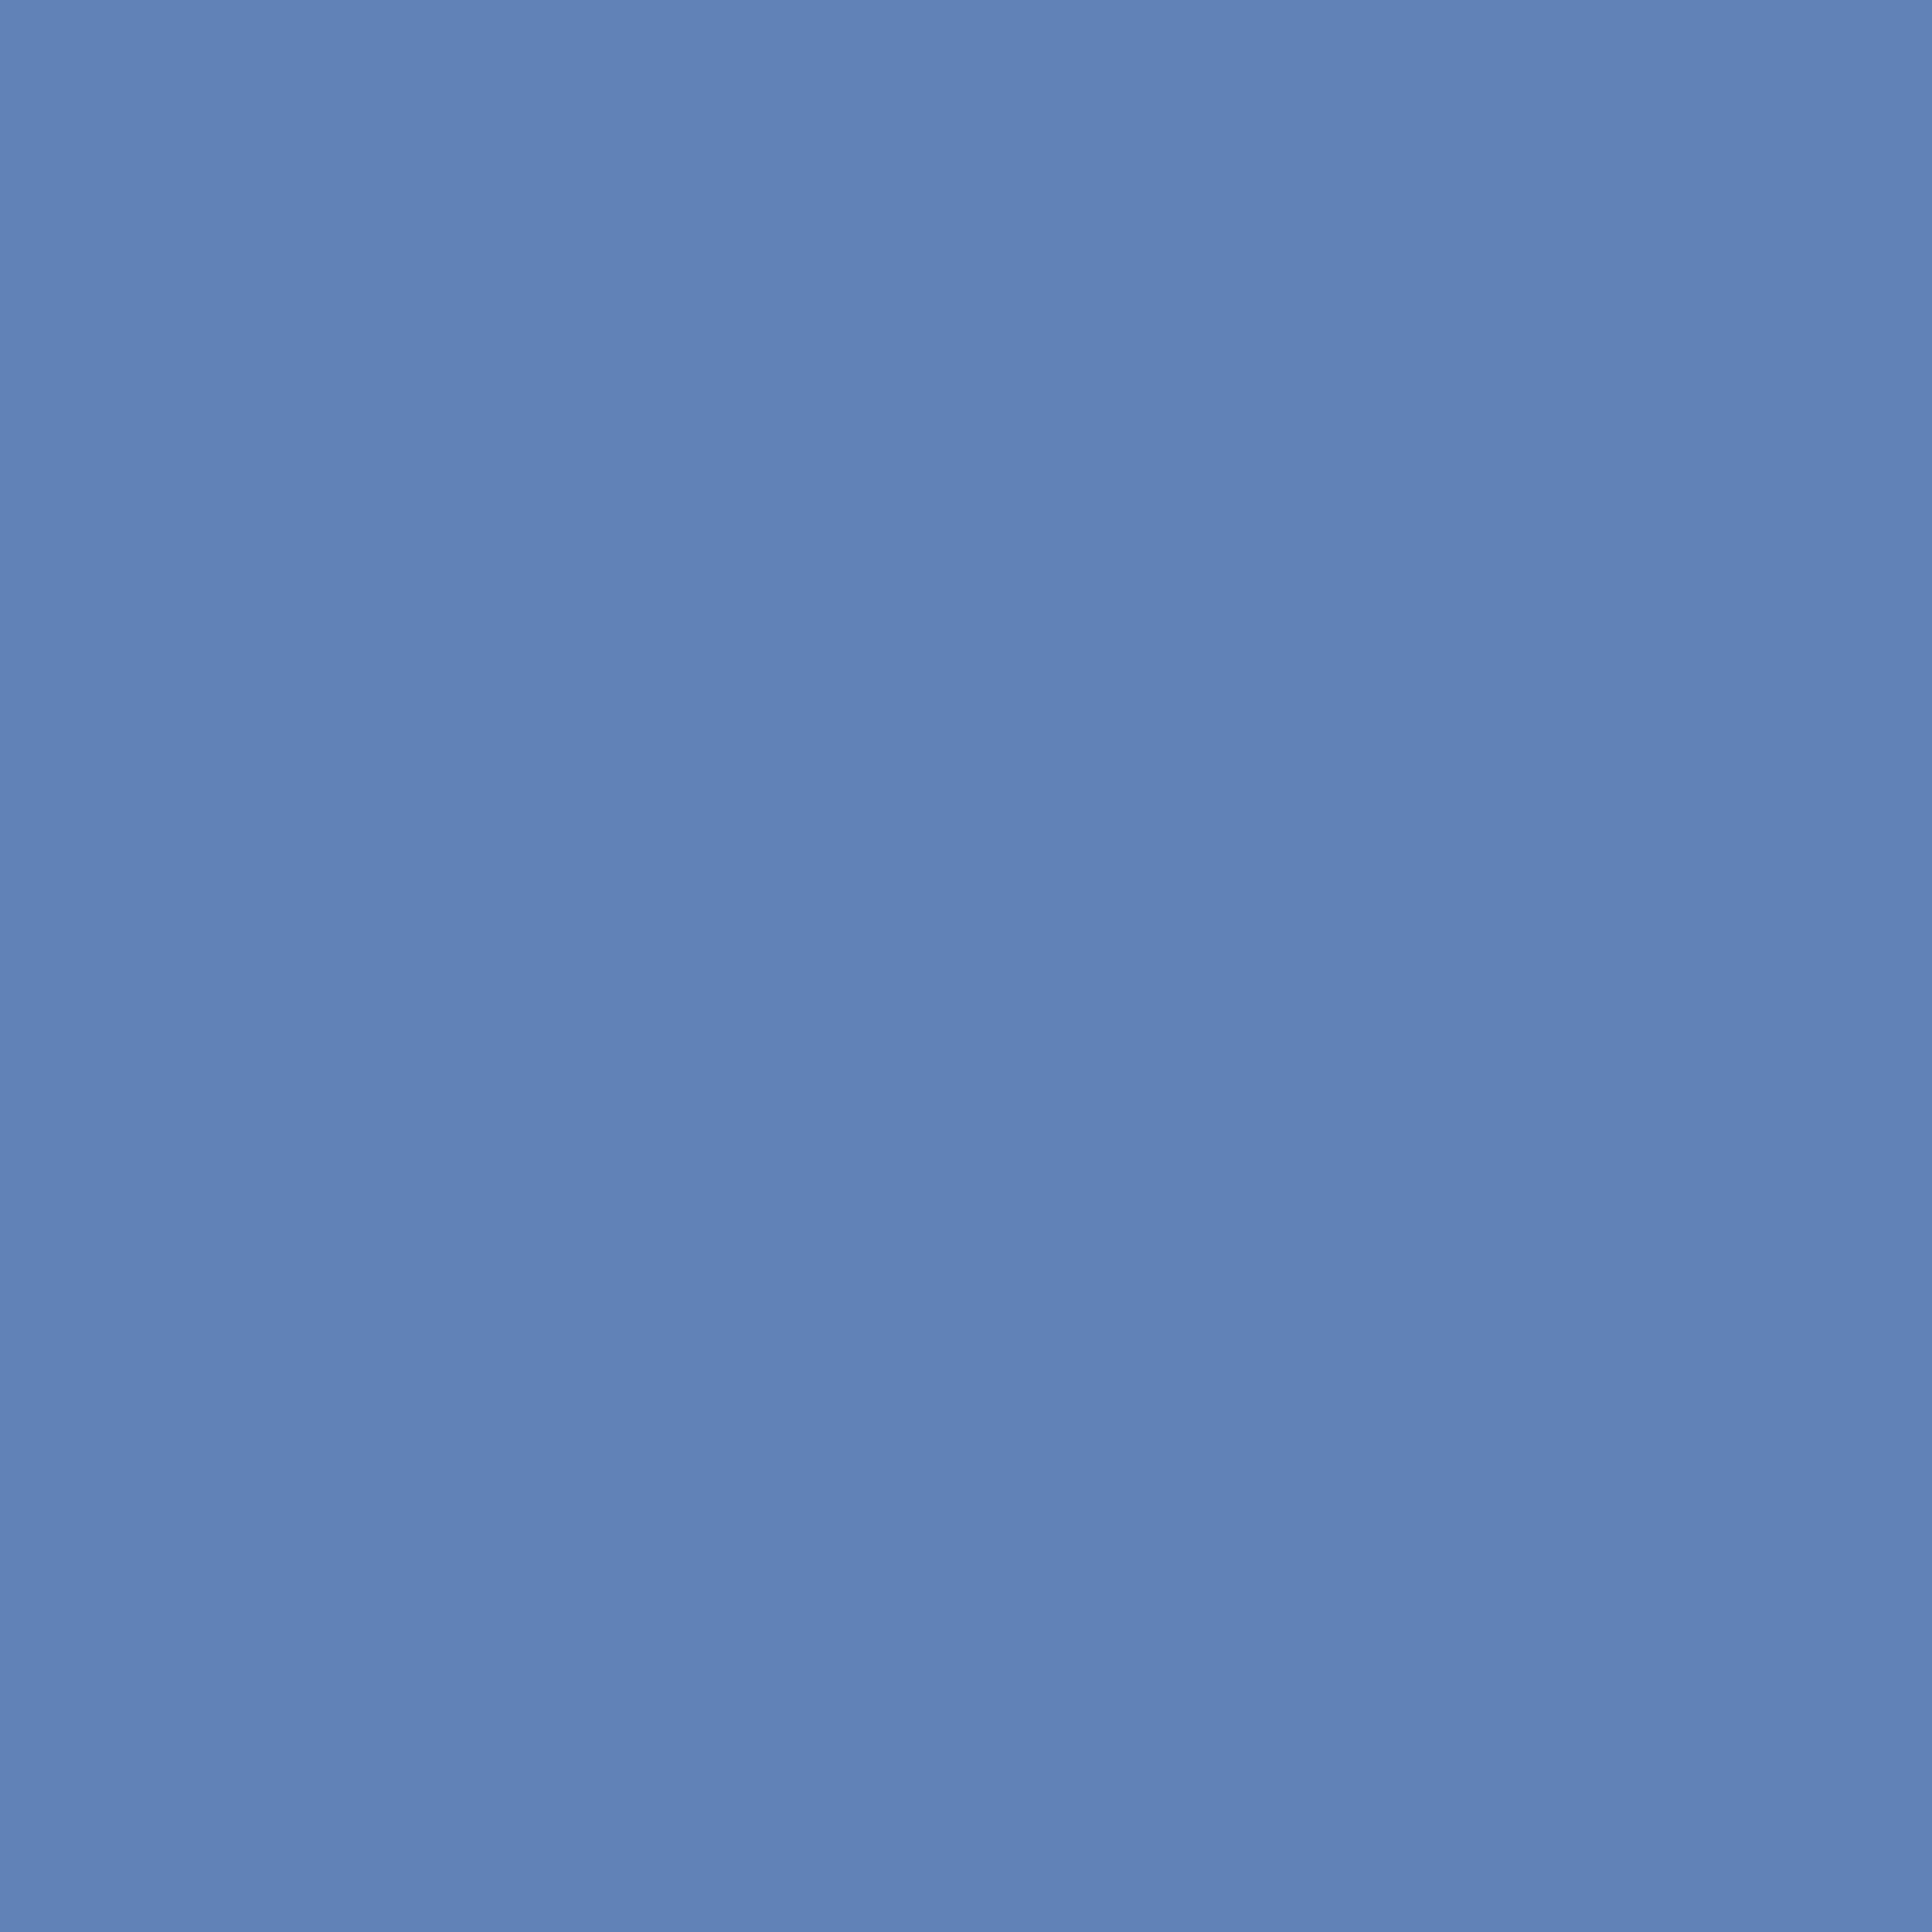 3600x3600 Glaucous Solid Color Background